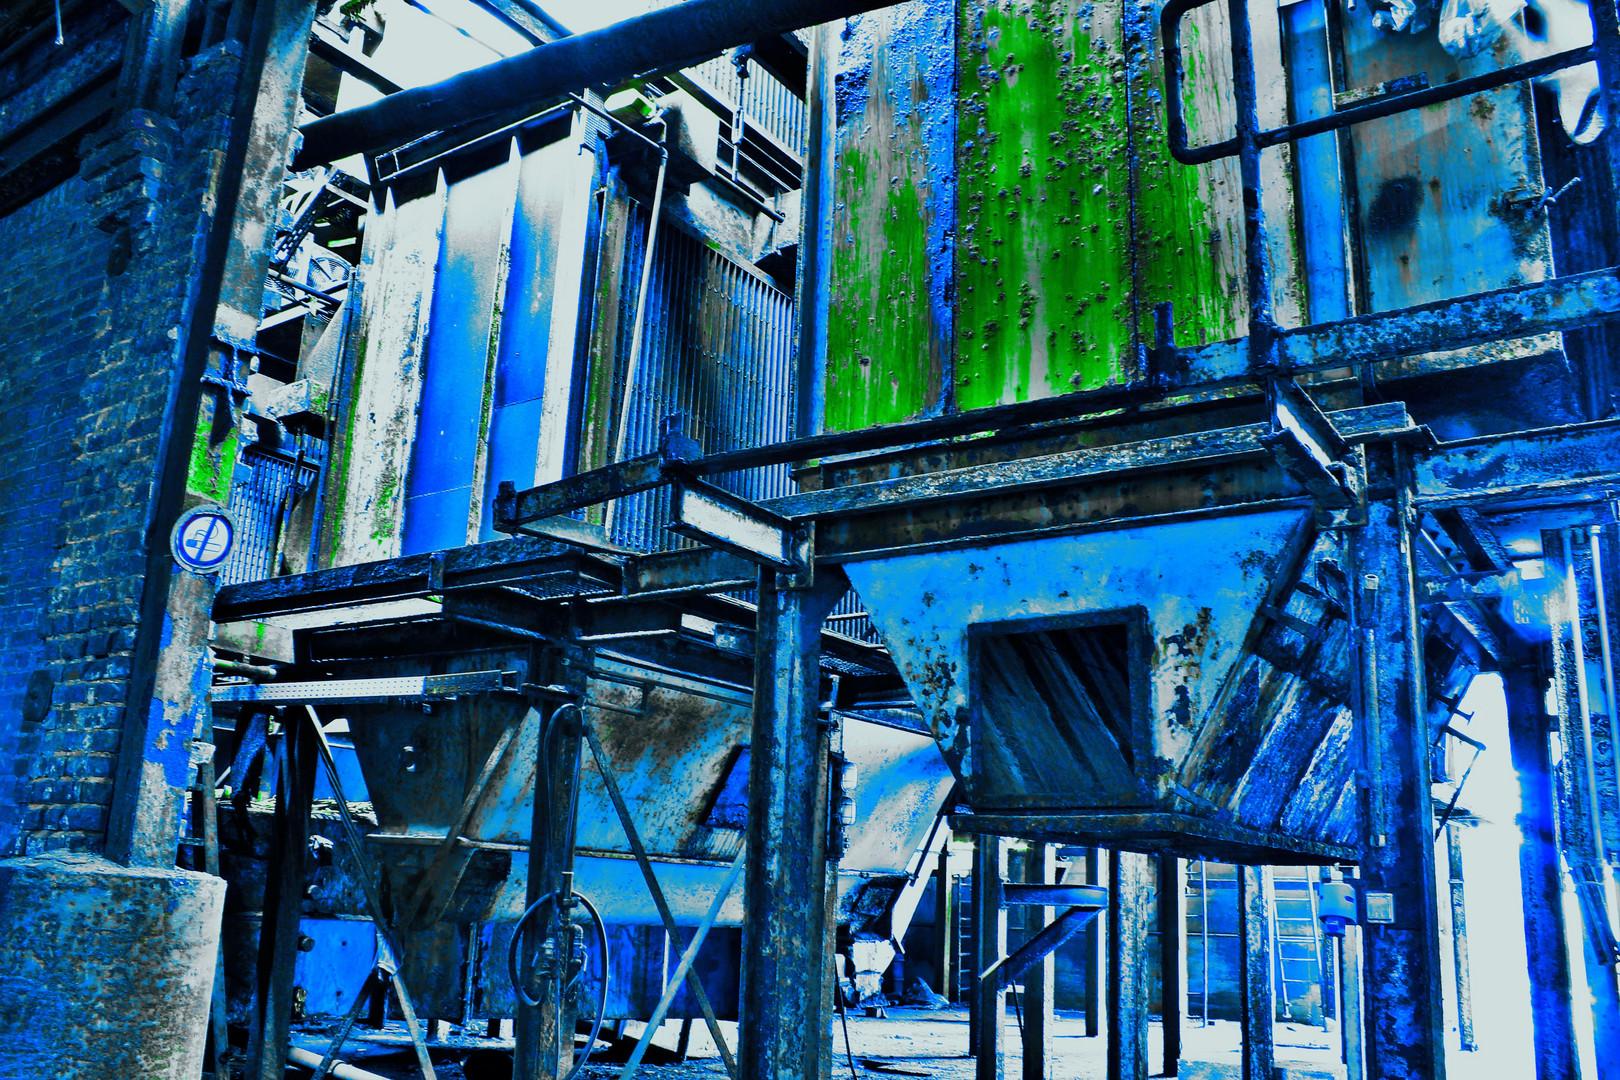 Blue machine